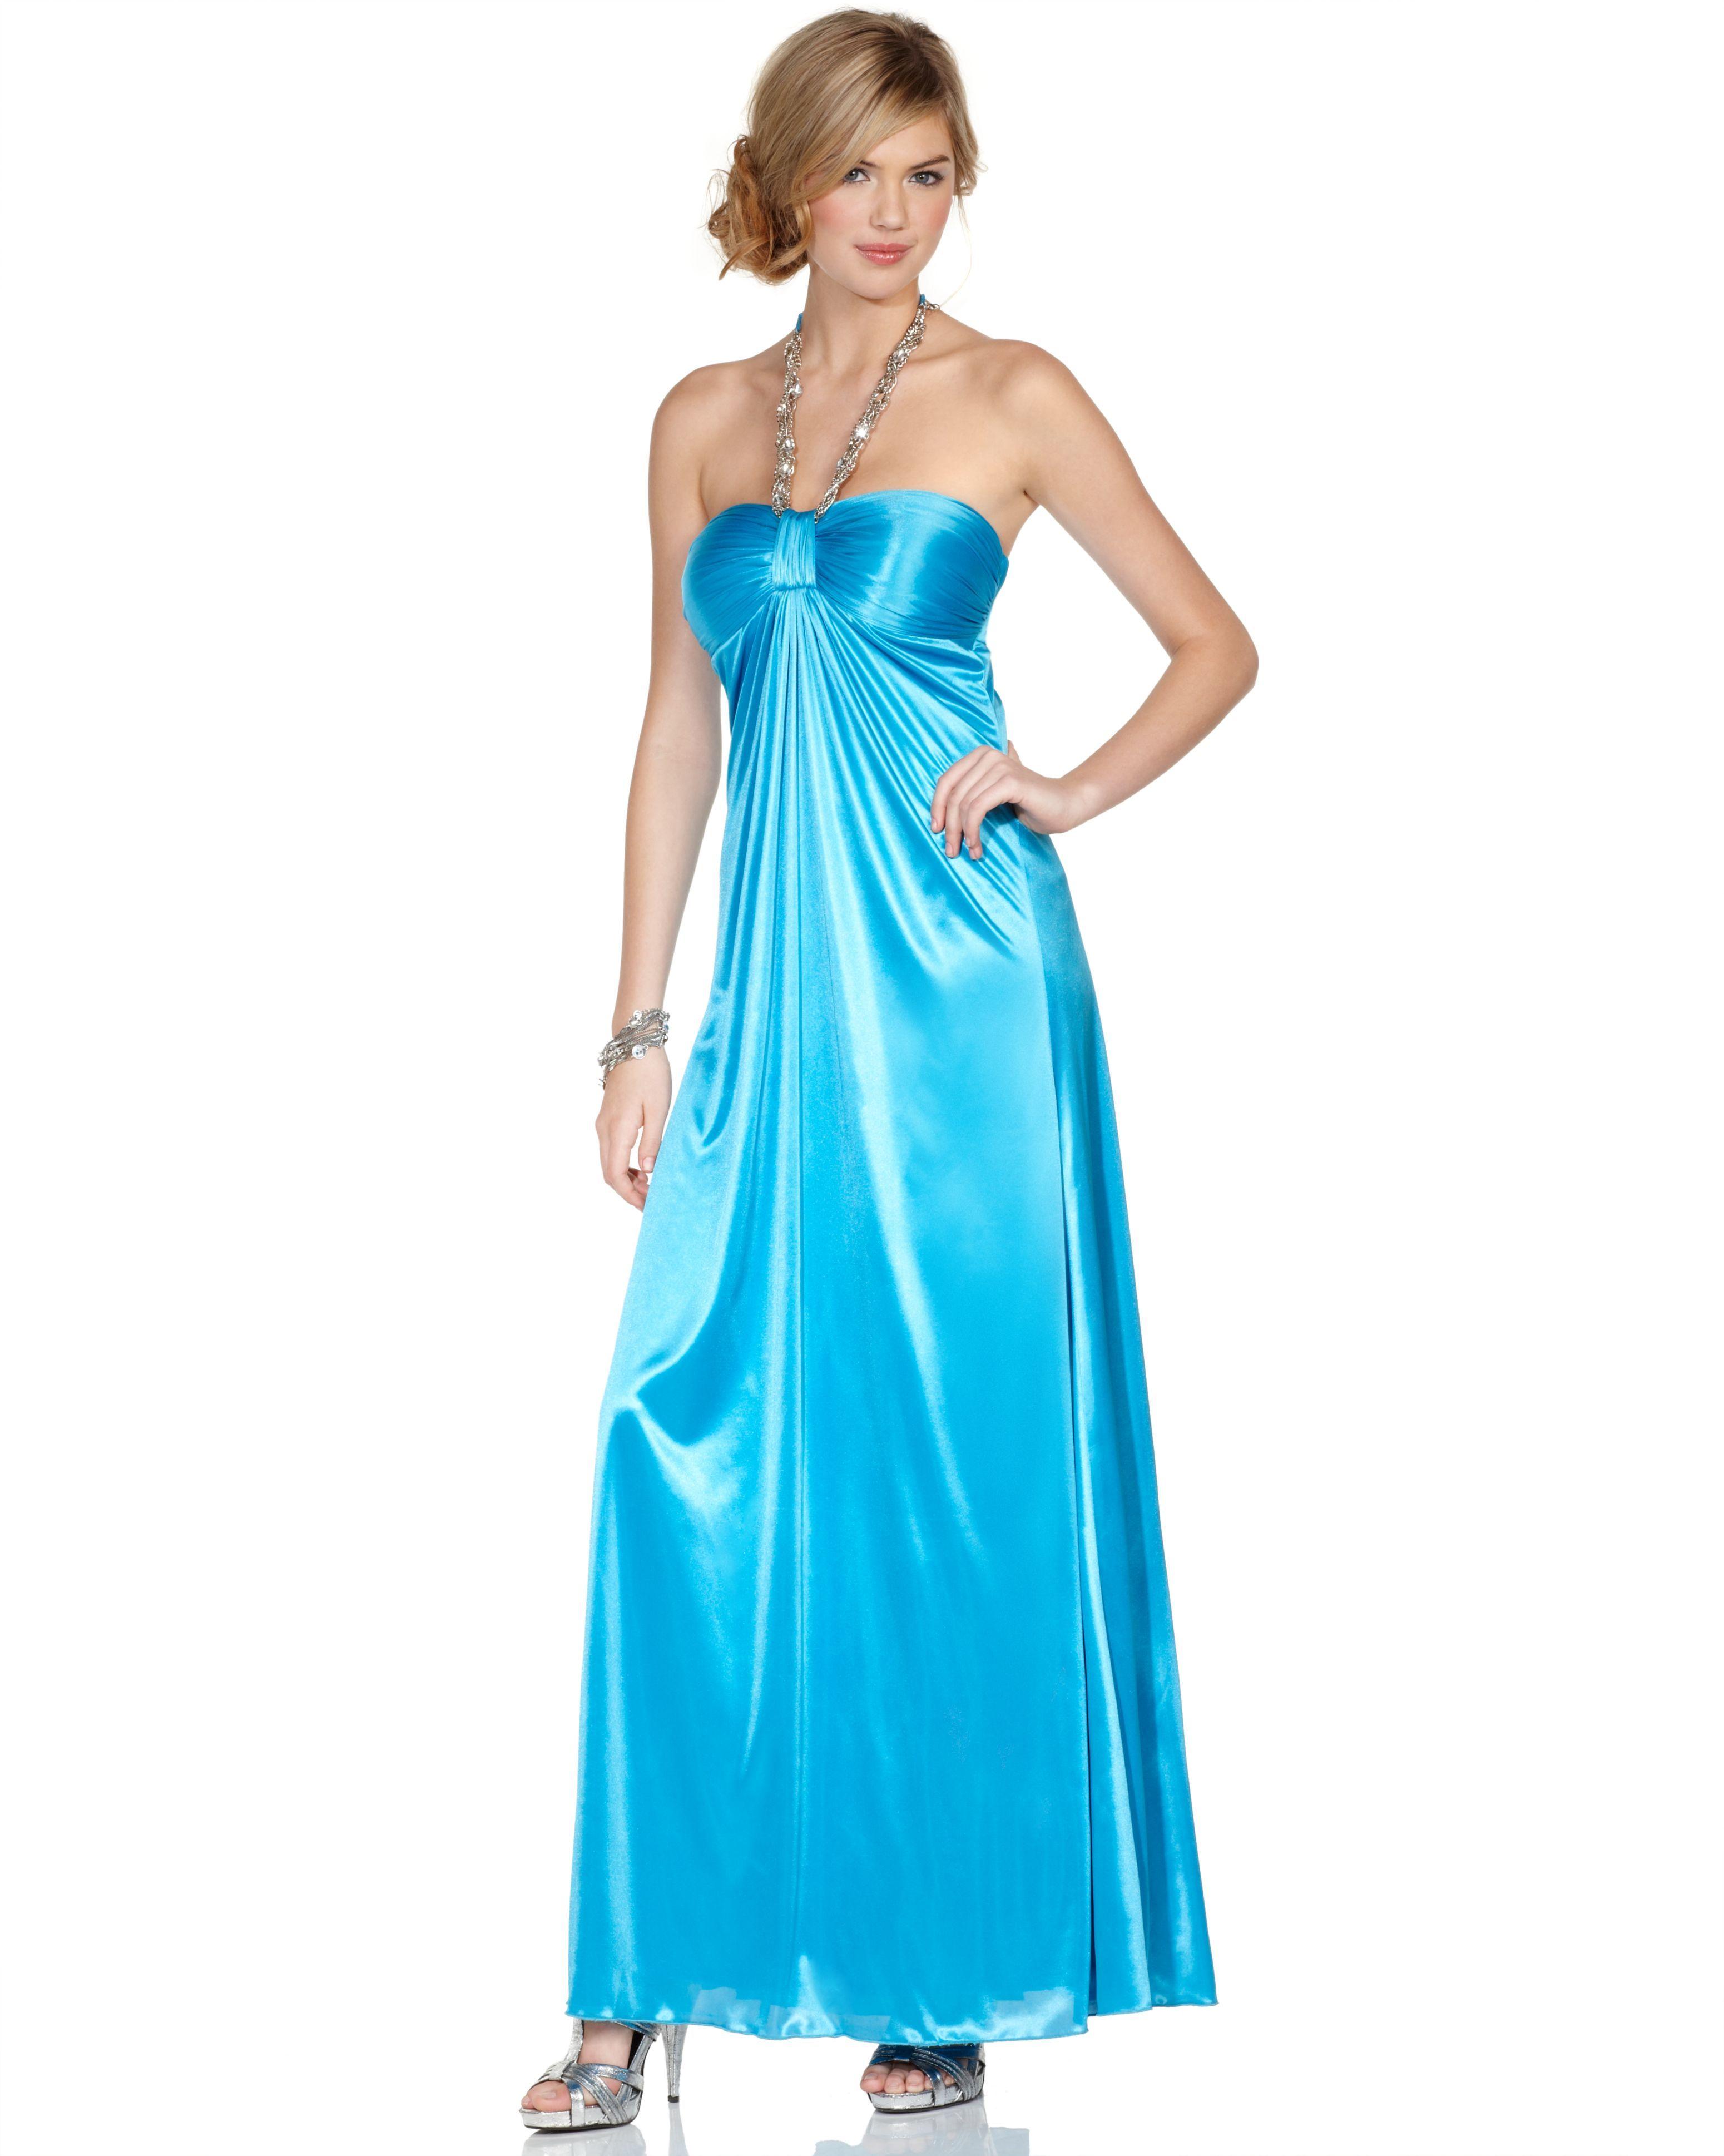 Macys dress kate upton macys dress pinterest prom dresses